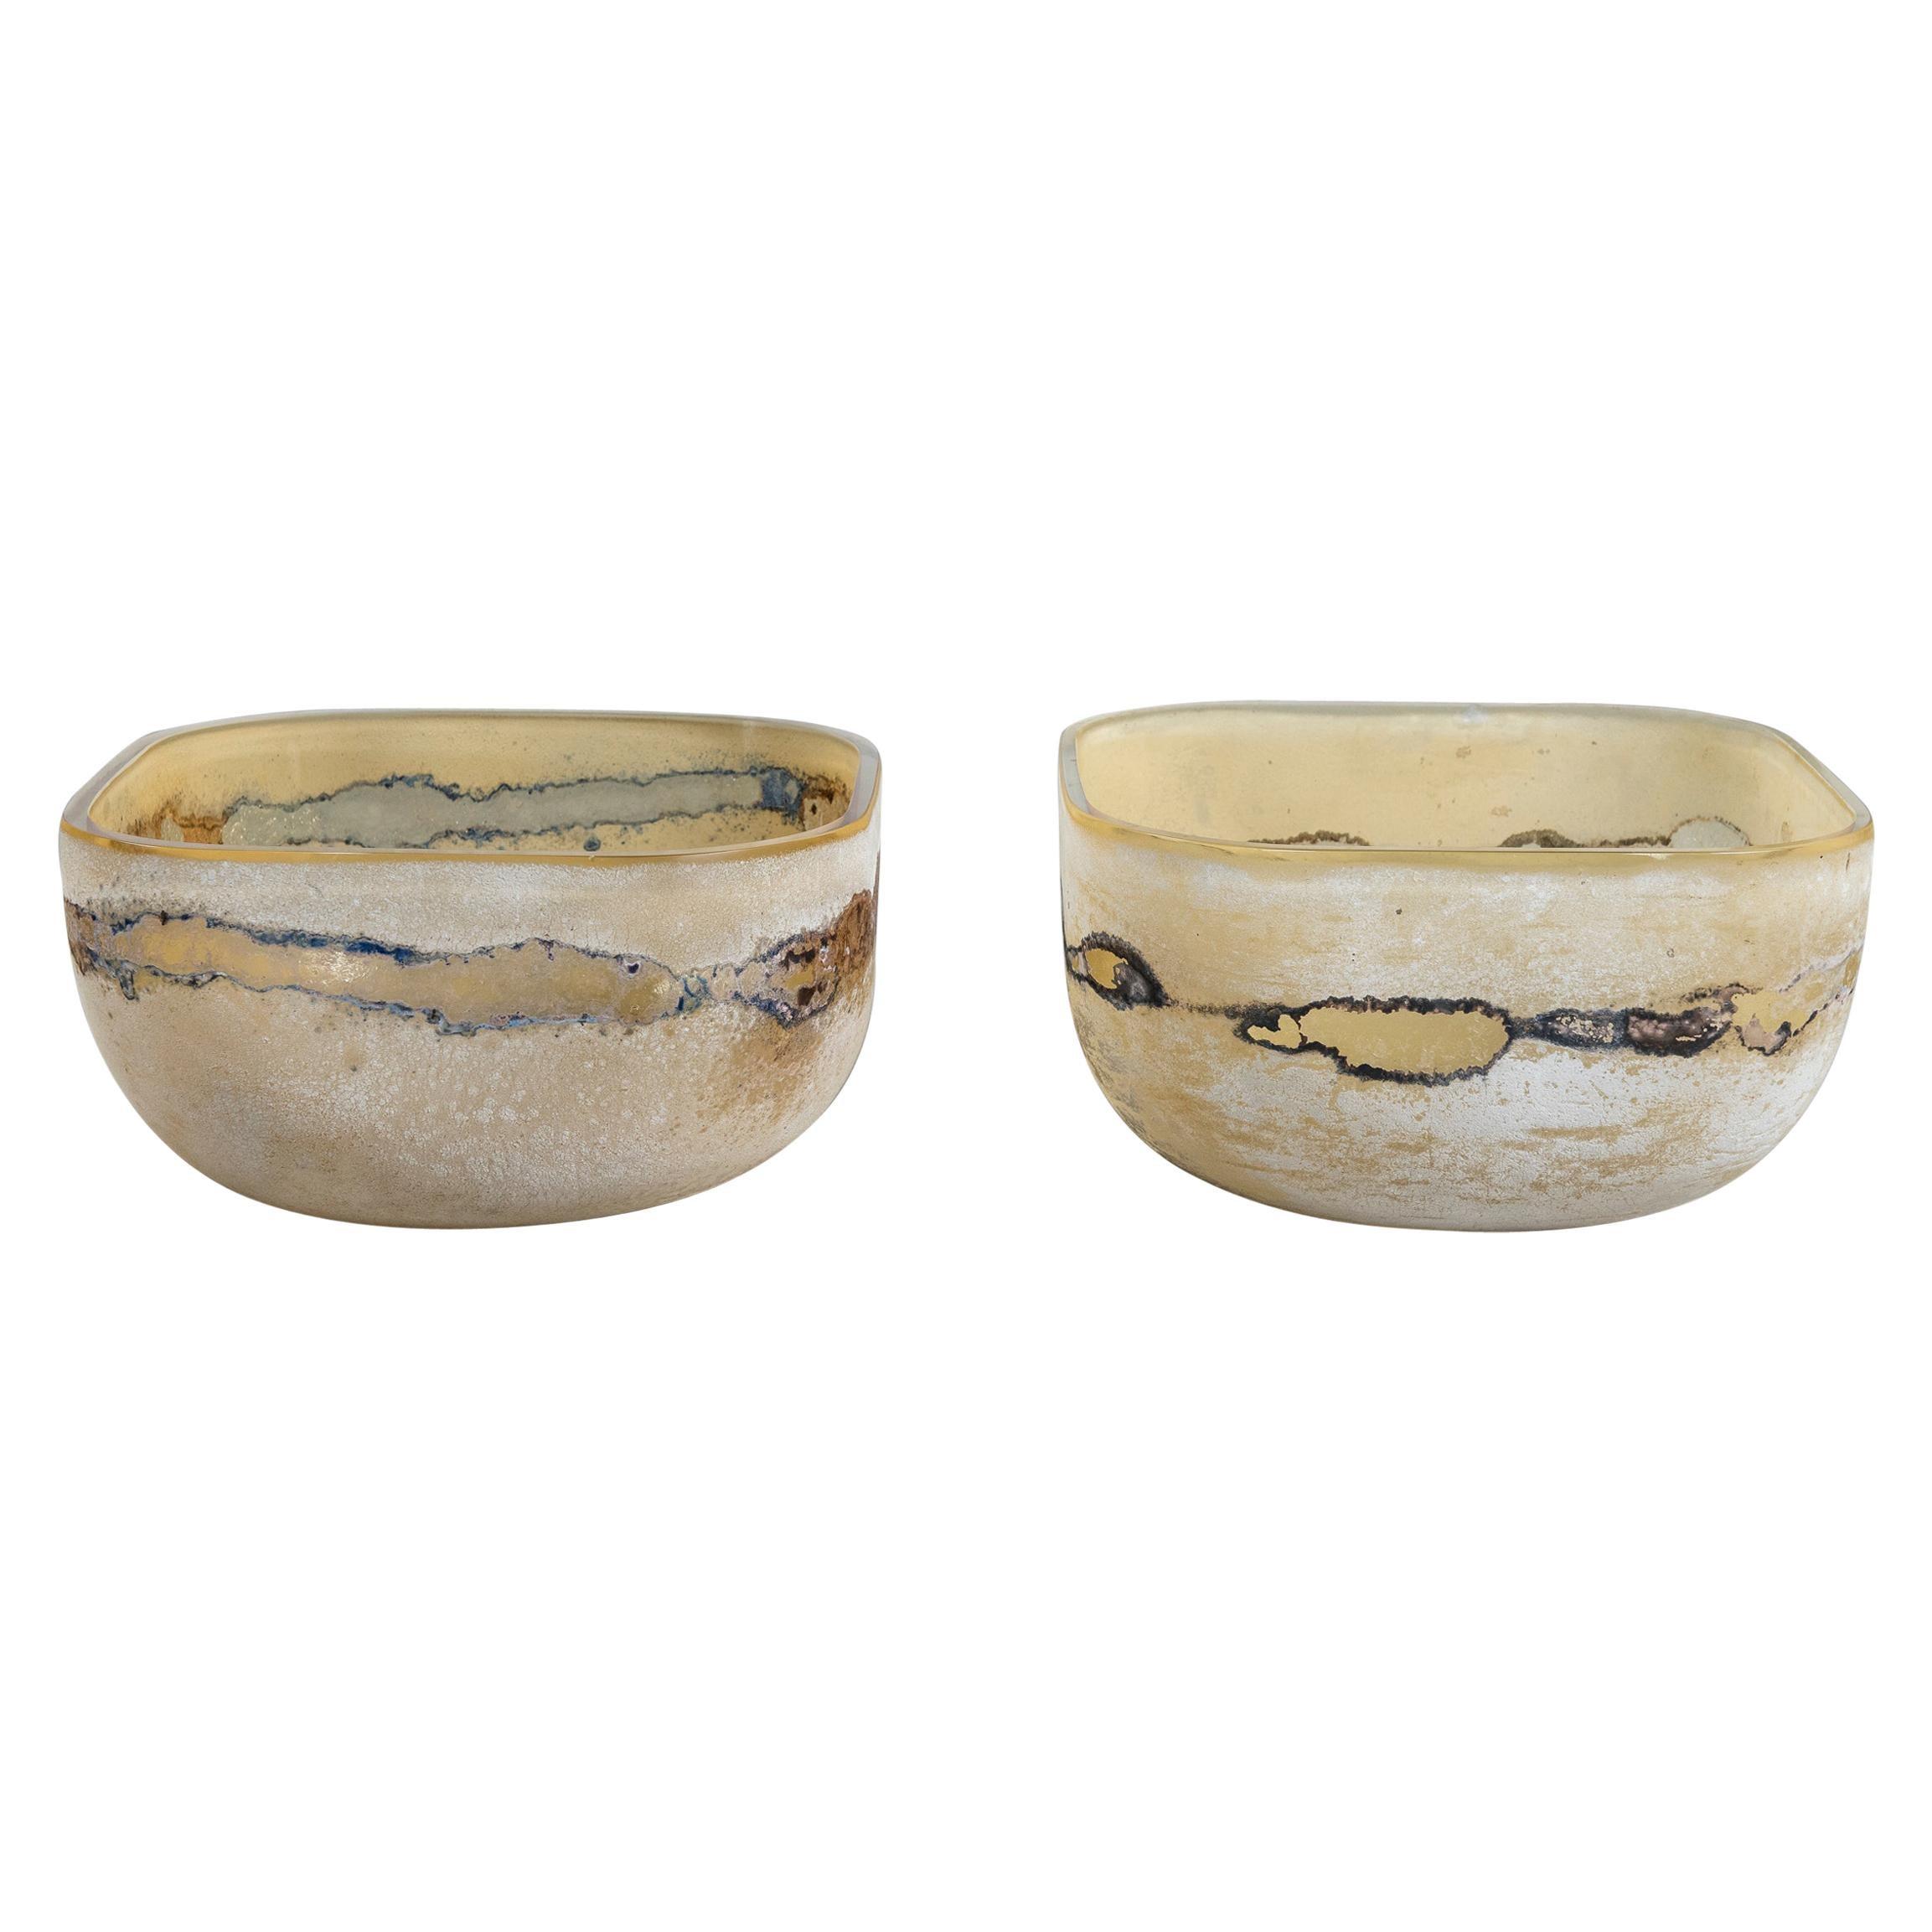 Pair of Scavo Glass Bowls Signed Barbini Murano, Italy, circa 1960